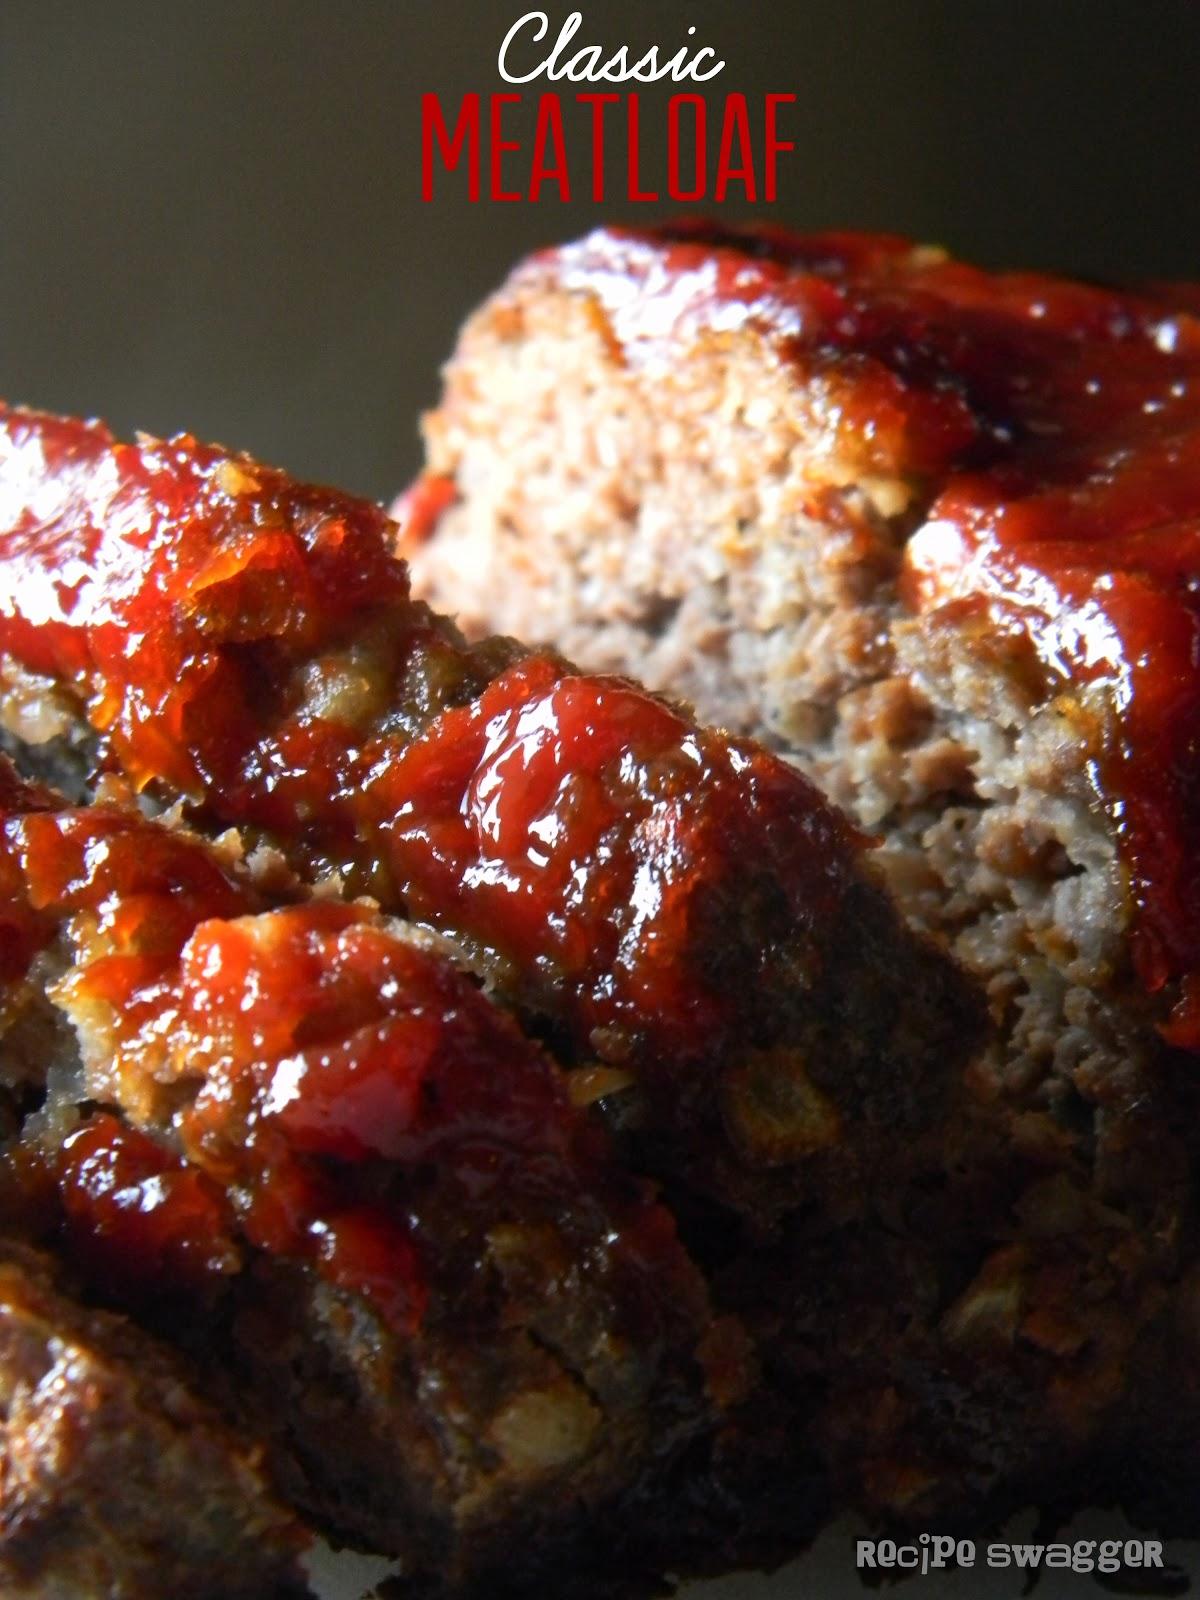 meatloaf chipotle meatloaf easy meatloaf classic meat loaf traditional ...